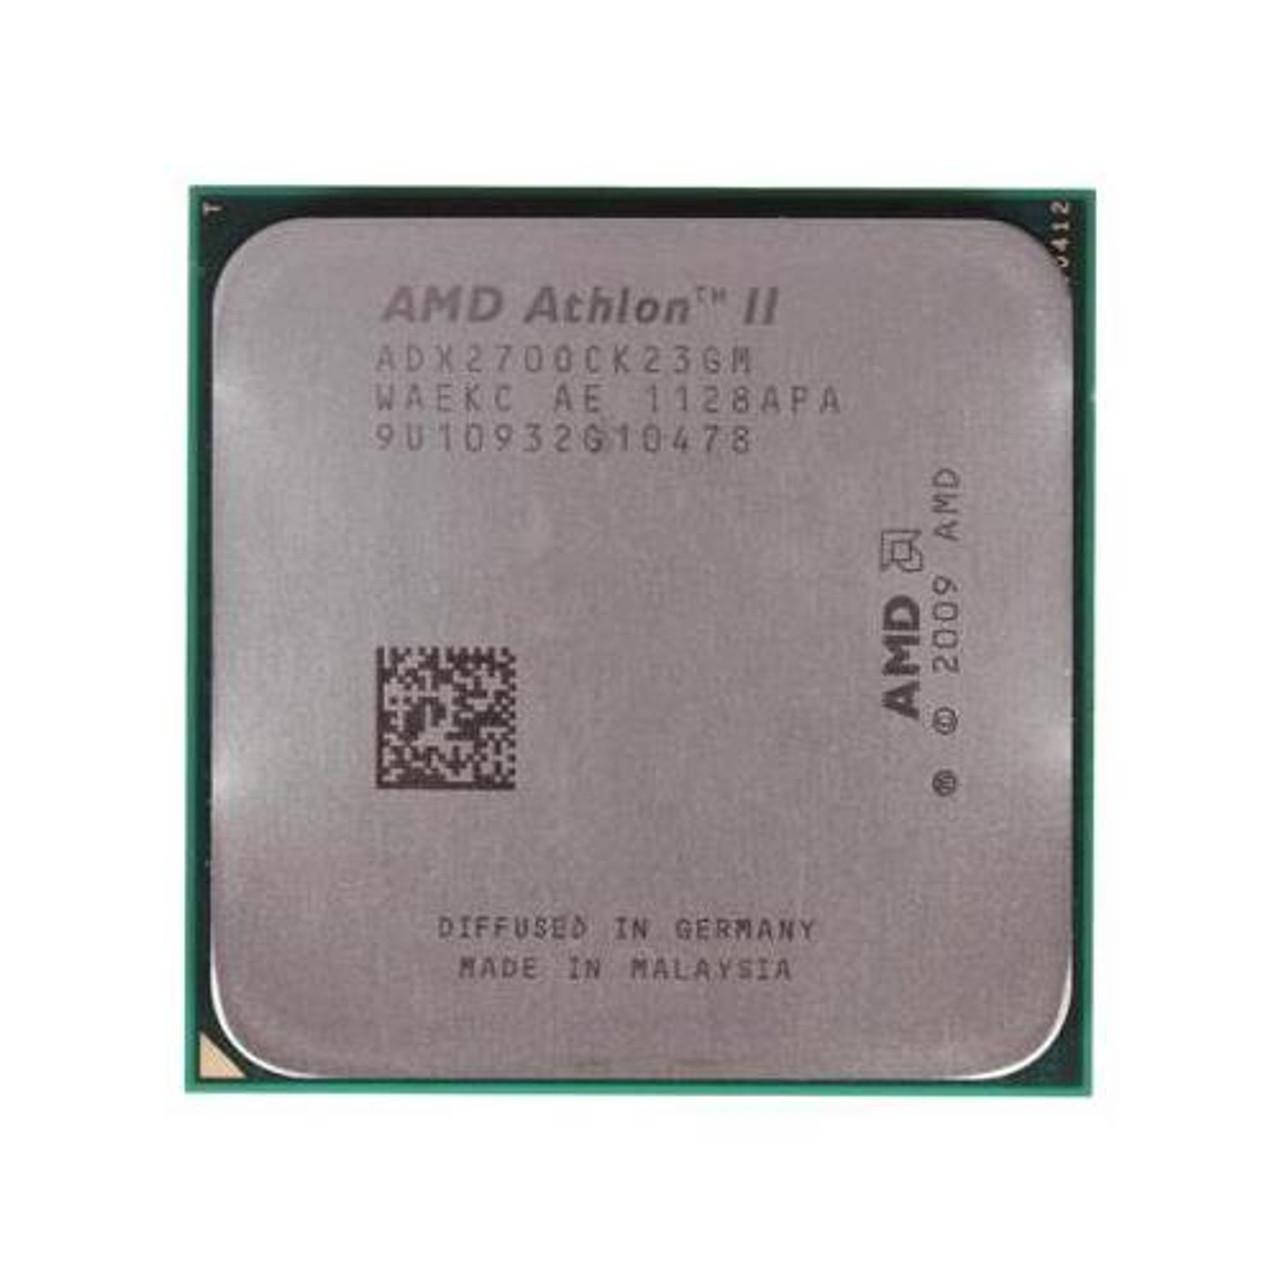 AMD Athlon II X2 260 3.2 GHz Dual-Core CPU Processor ADX260OCK23GM Socket AM3